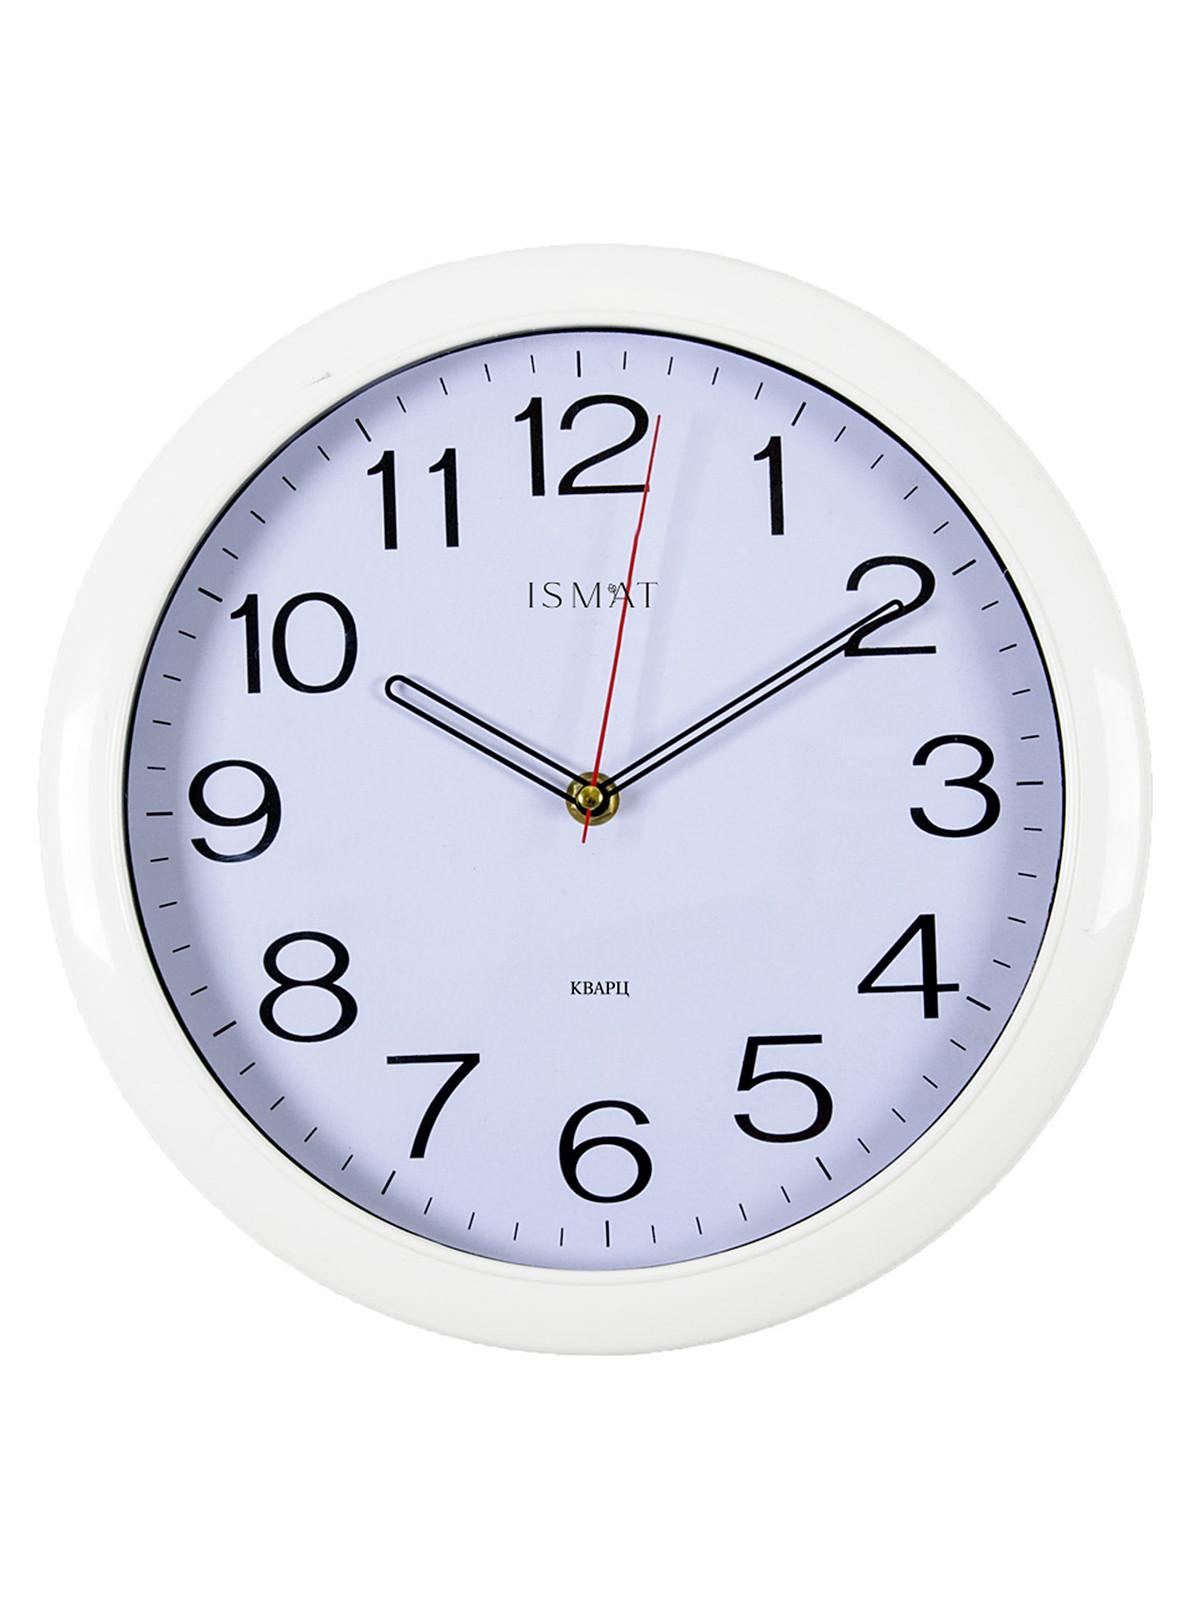 Часы настенные круг d=29см, корпус белый